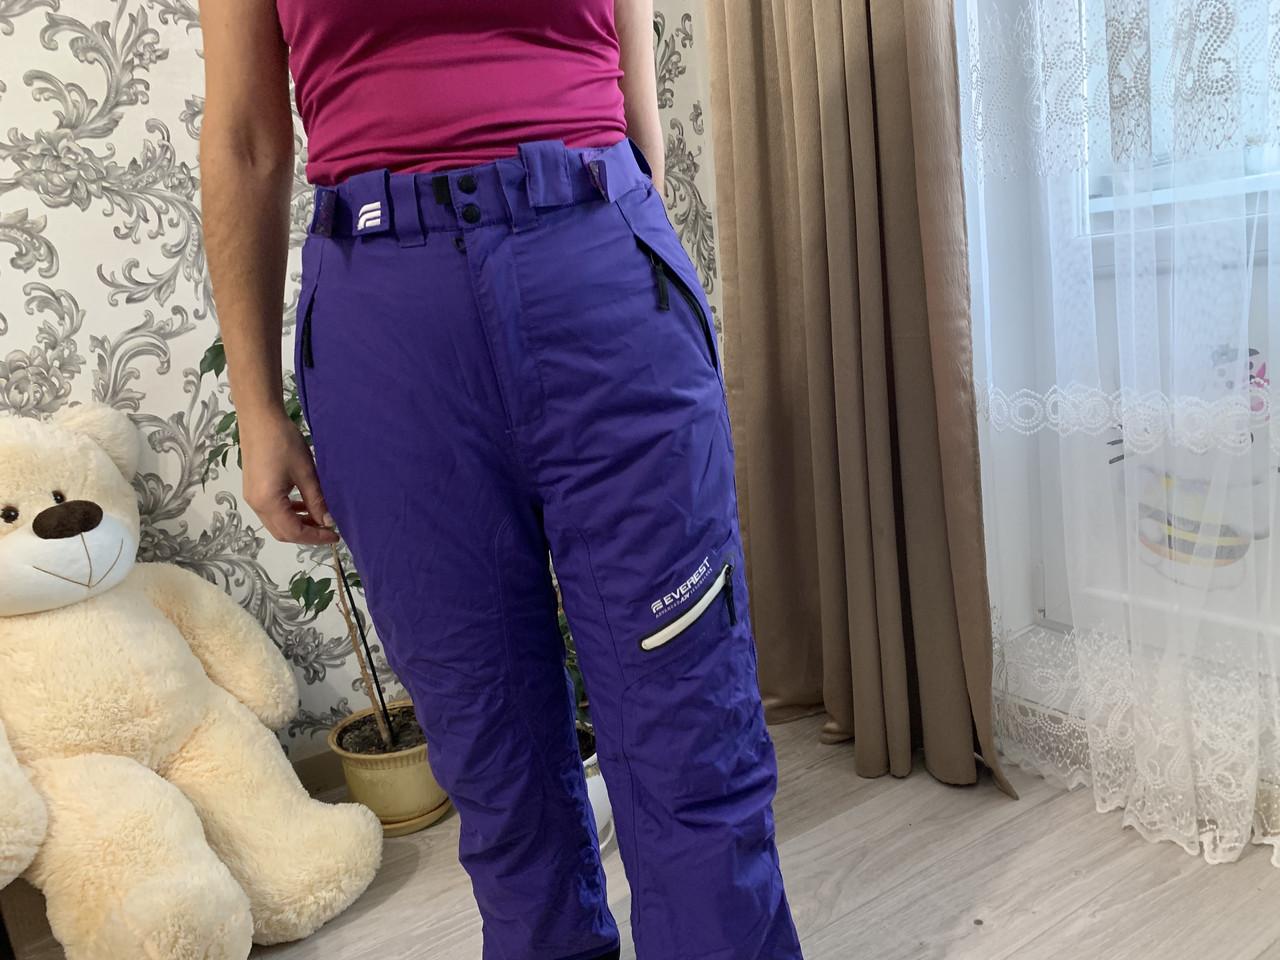 Сноуборд Лыжные тёплые фиолетовые  штаны Everest Thinsulate